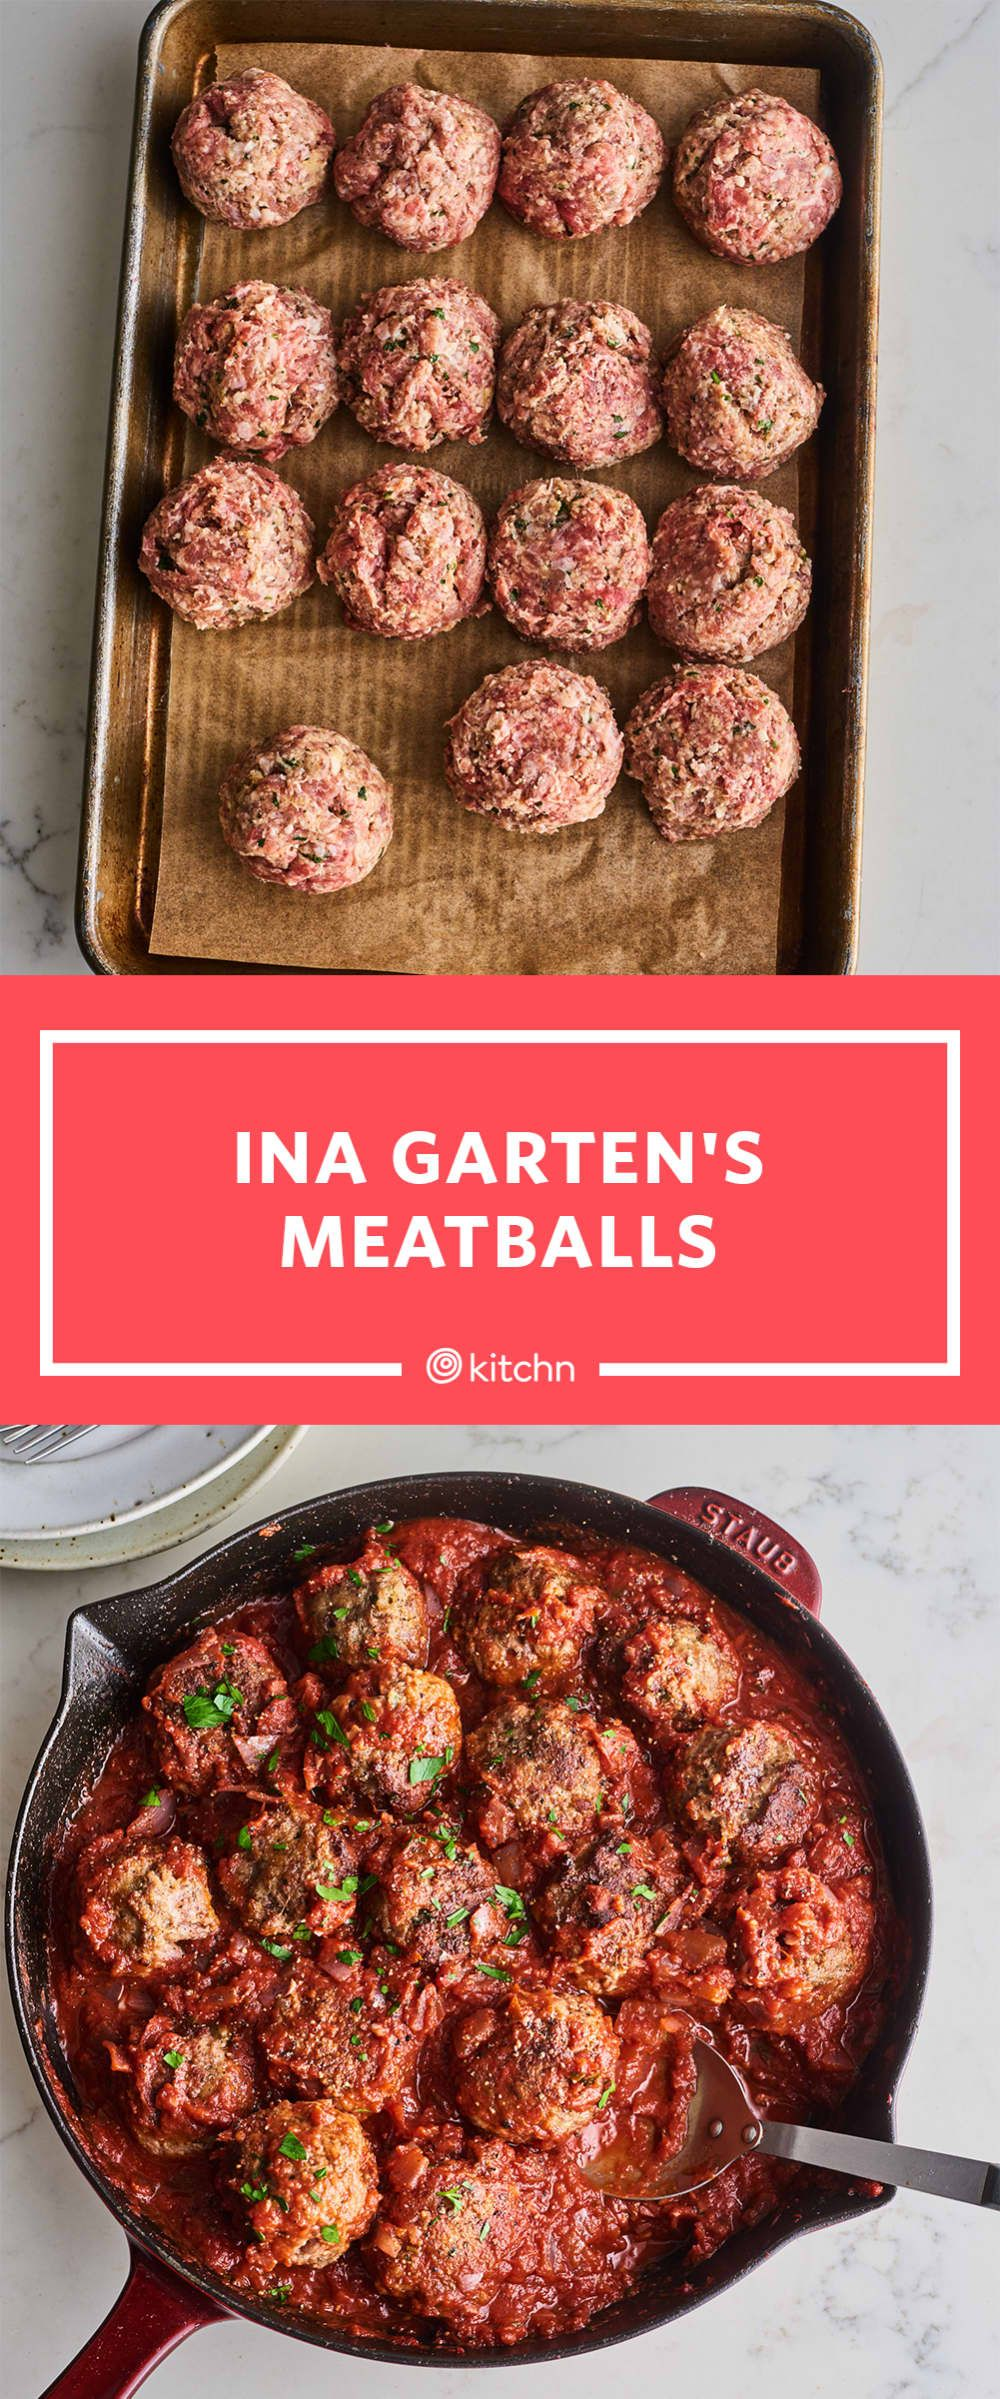 Ina Garten's Meatball Recipe Review   Kitchn